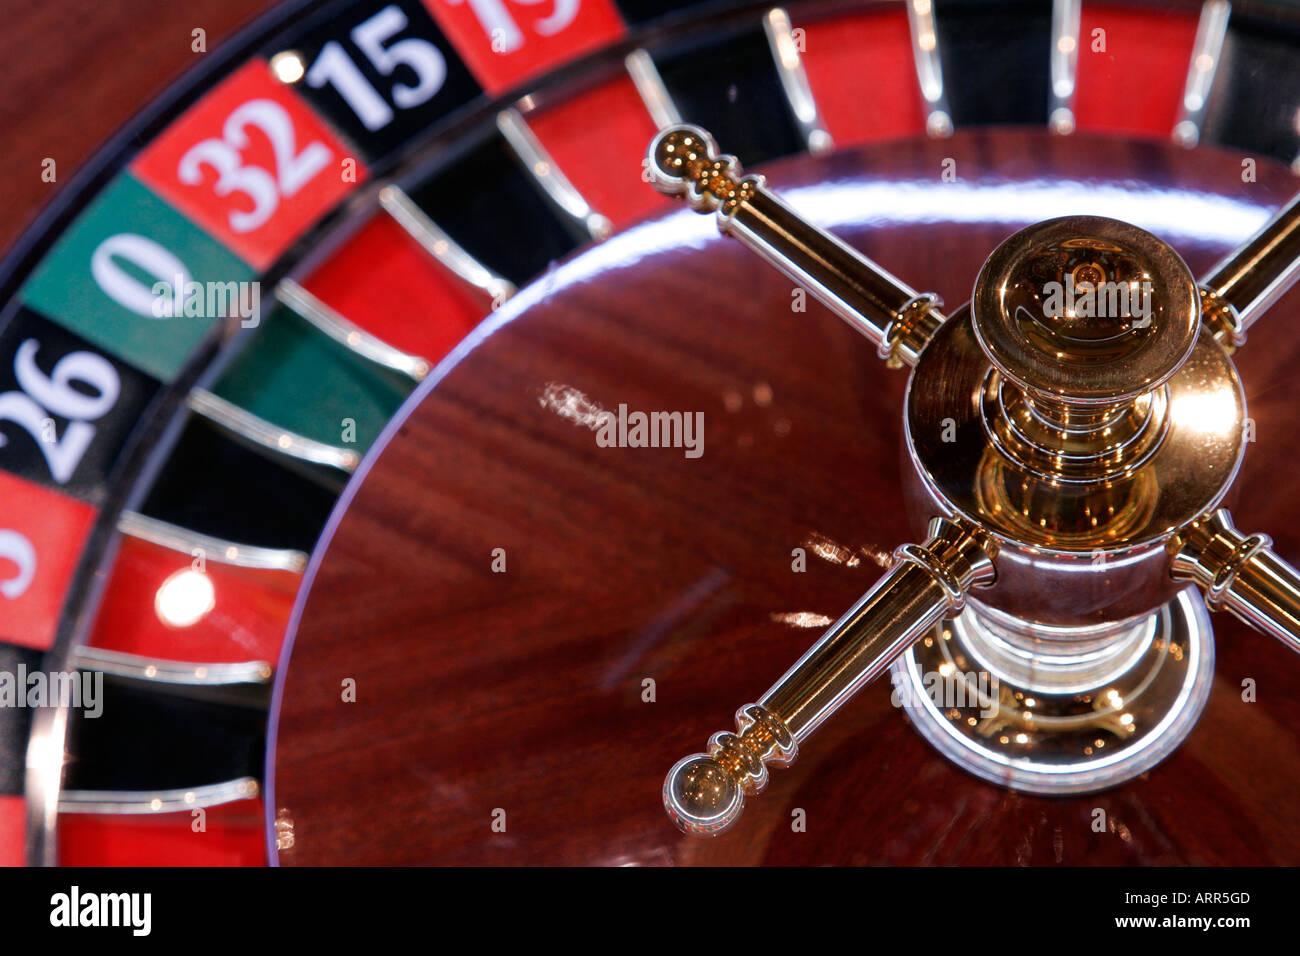 online gambling legal in south korea